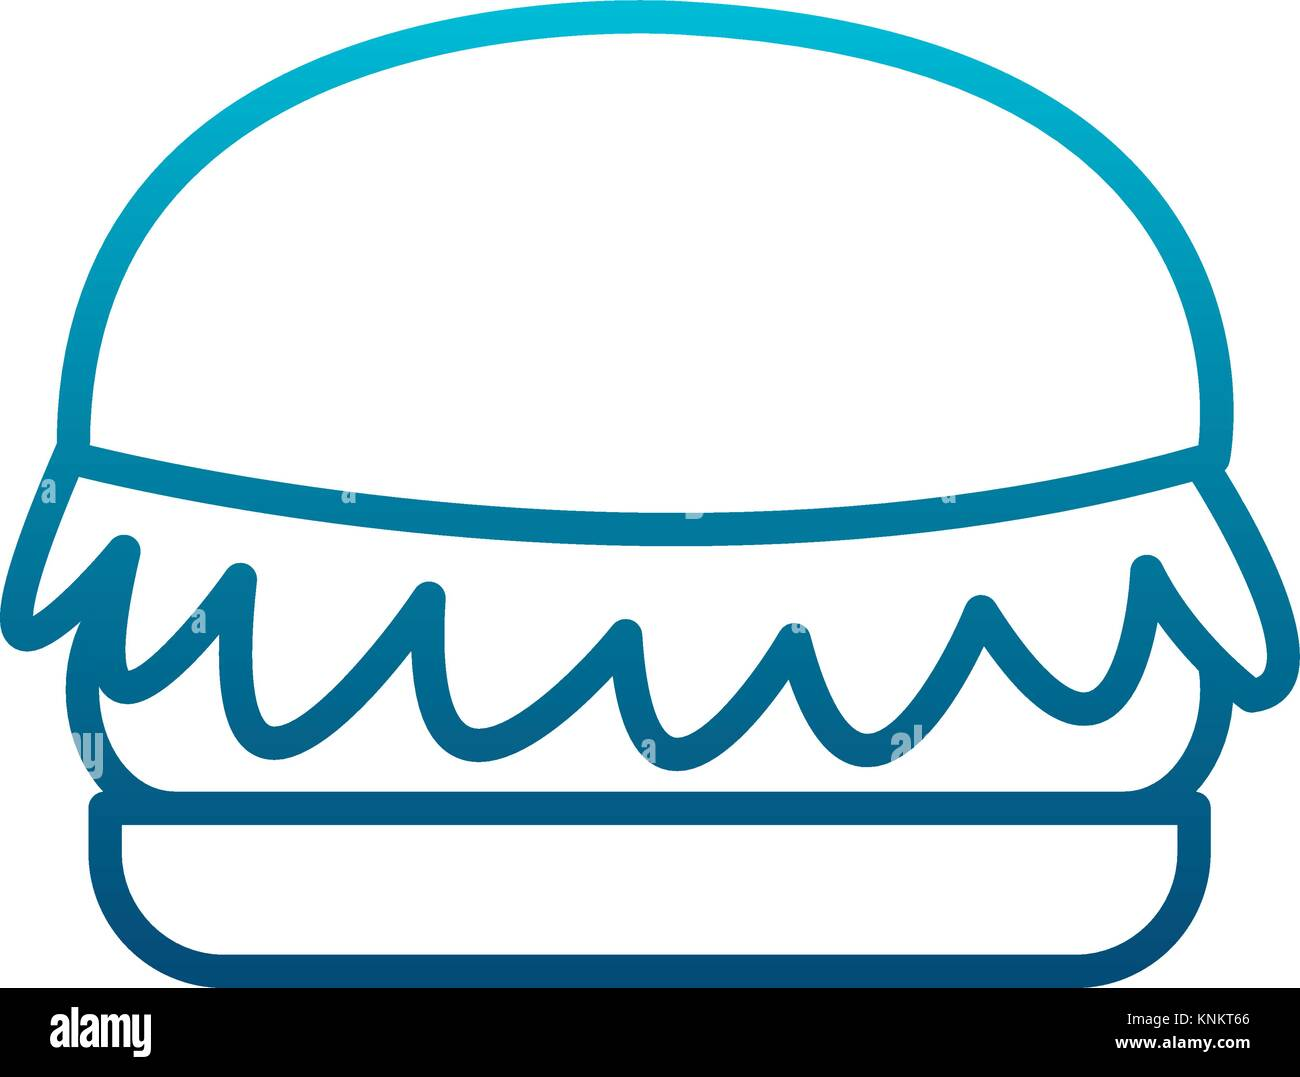 hight resolution of hamburger fast food stock vector